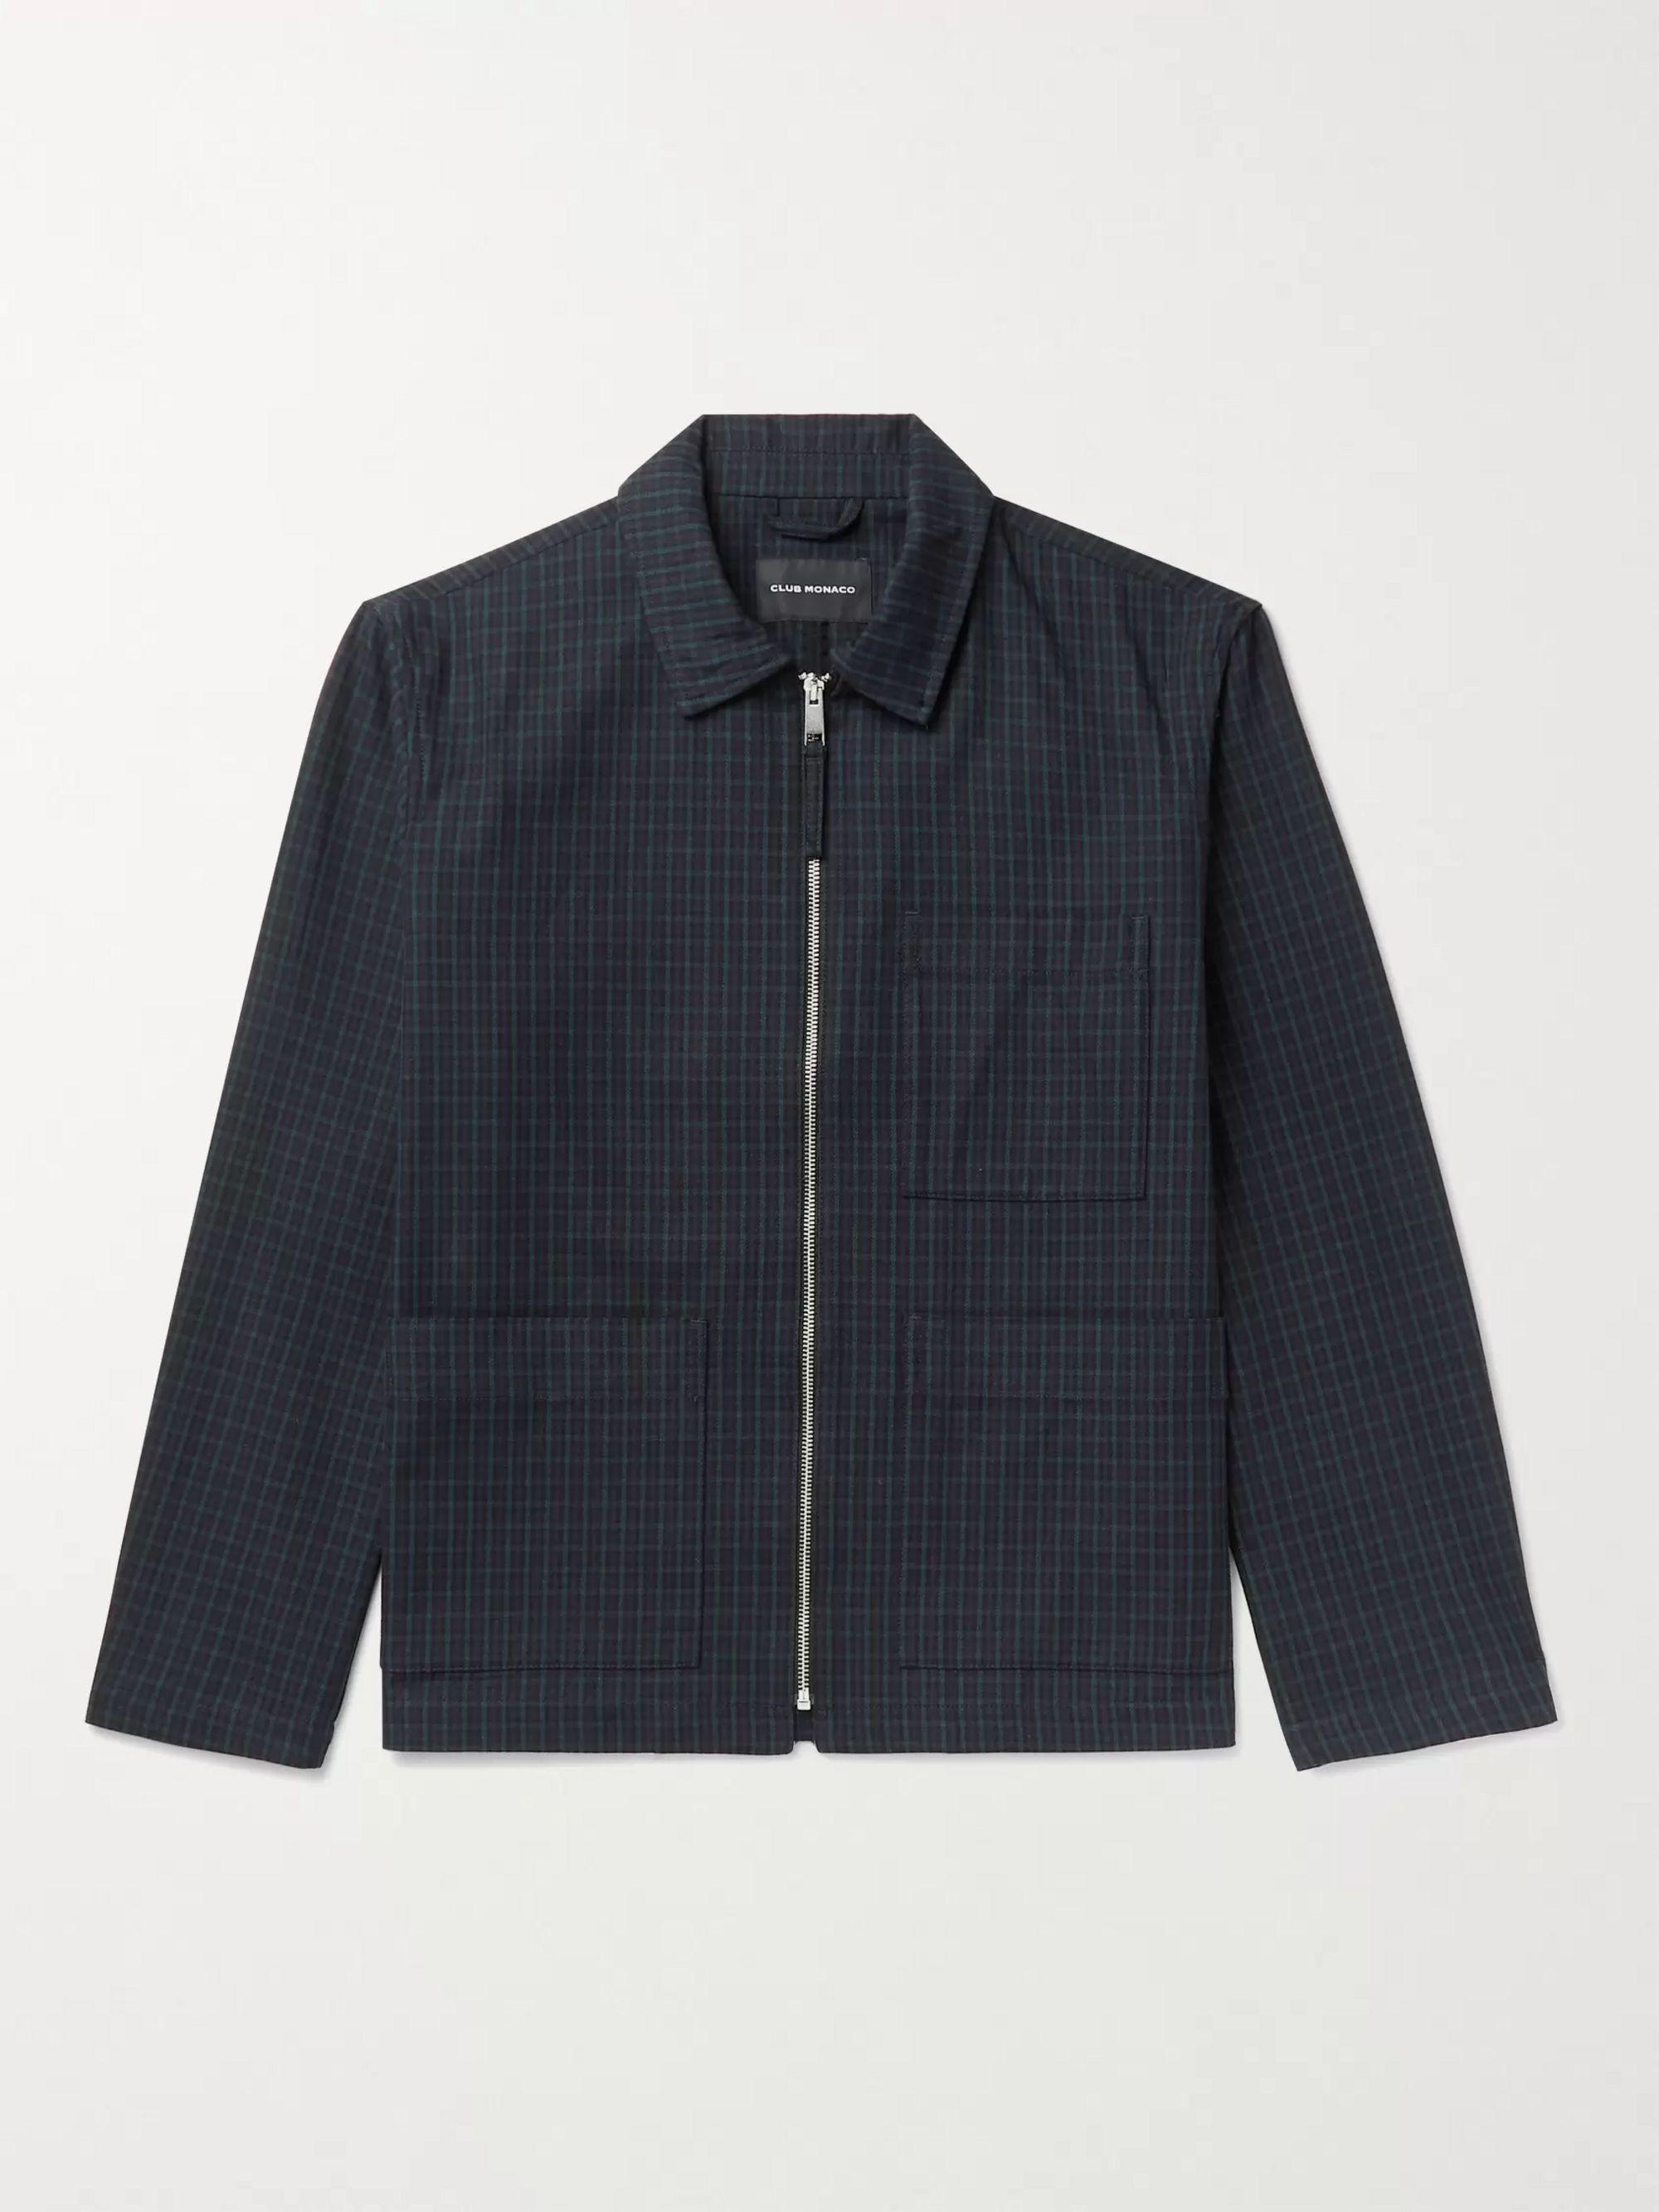 CLUB MONACO Checked Cotton-Blend Blouson Jacket